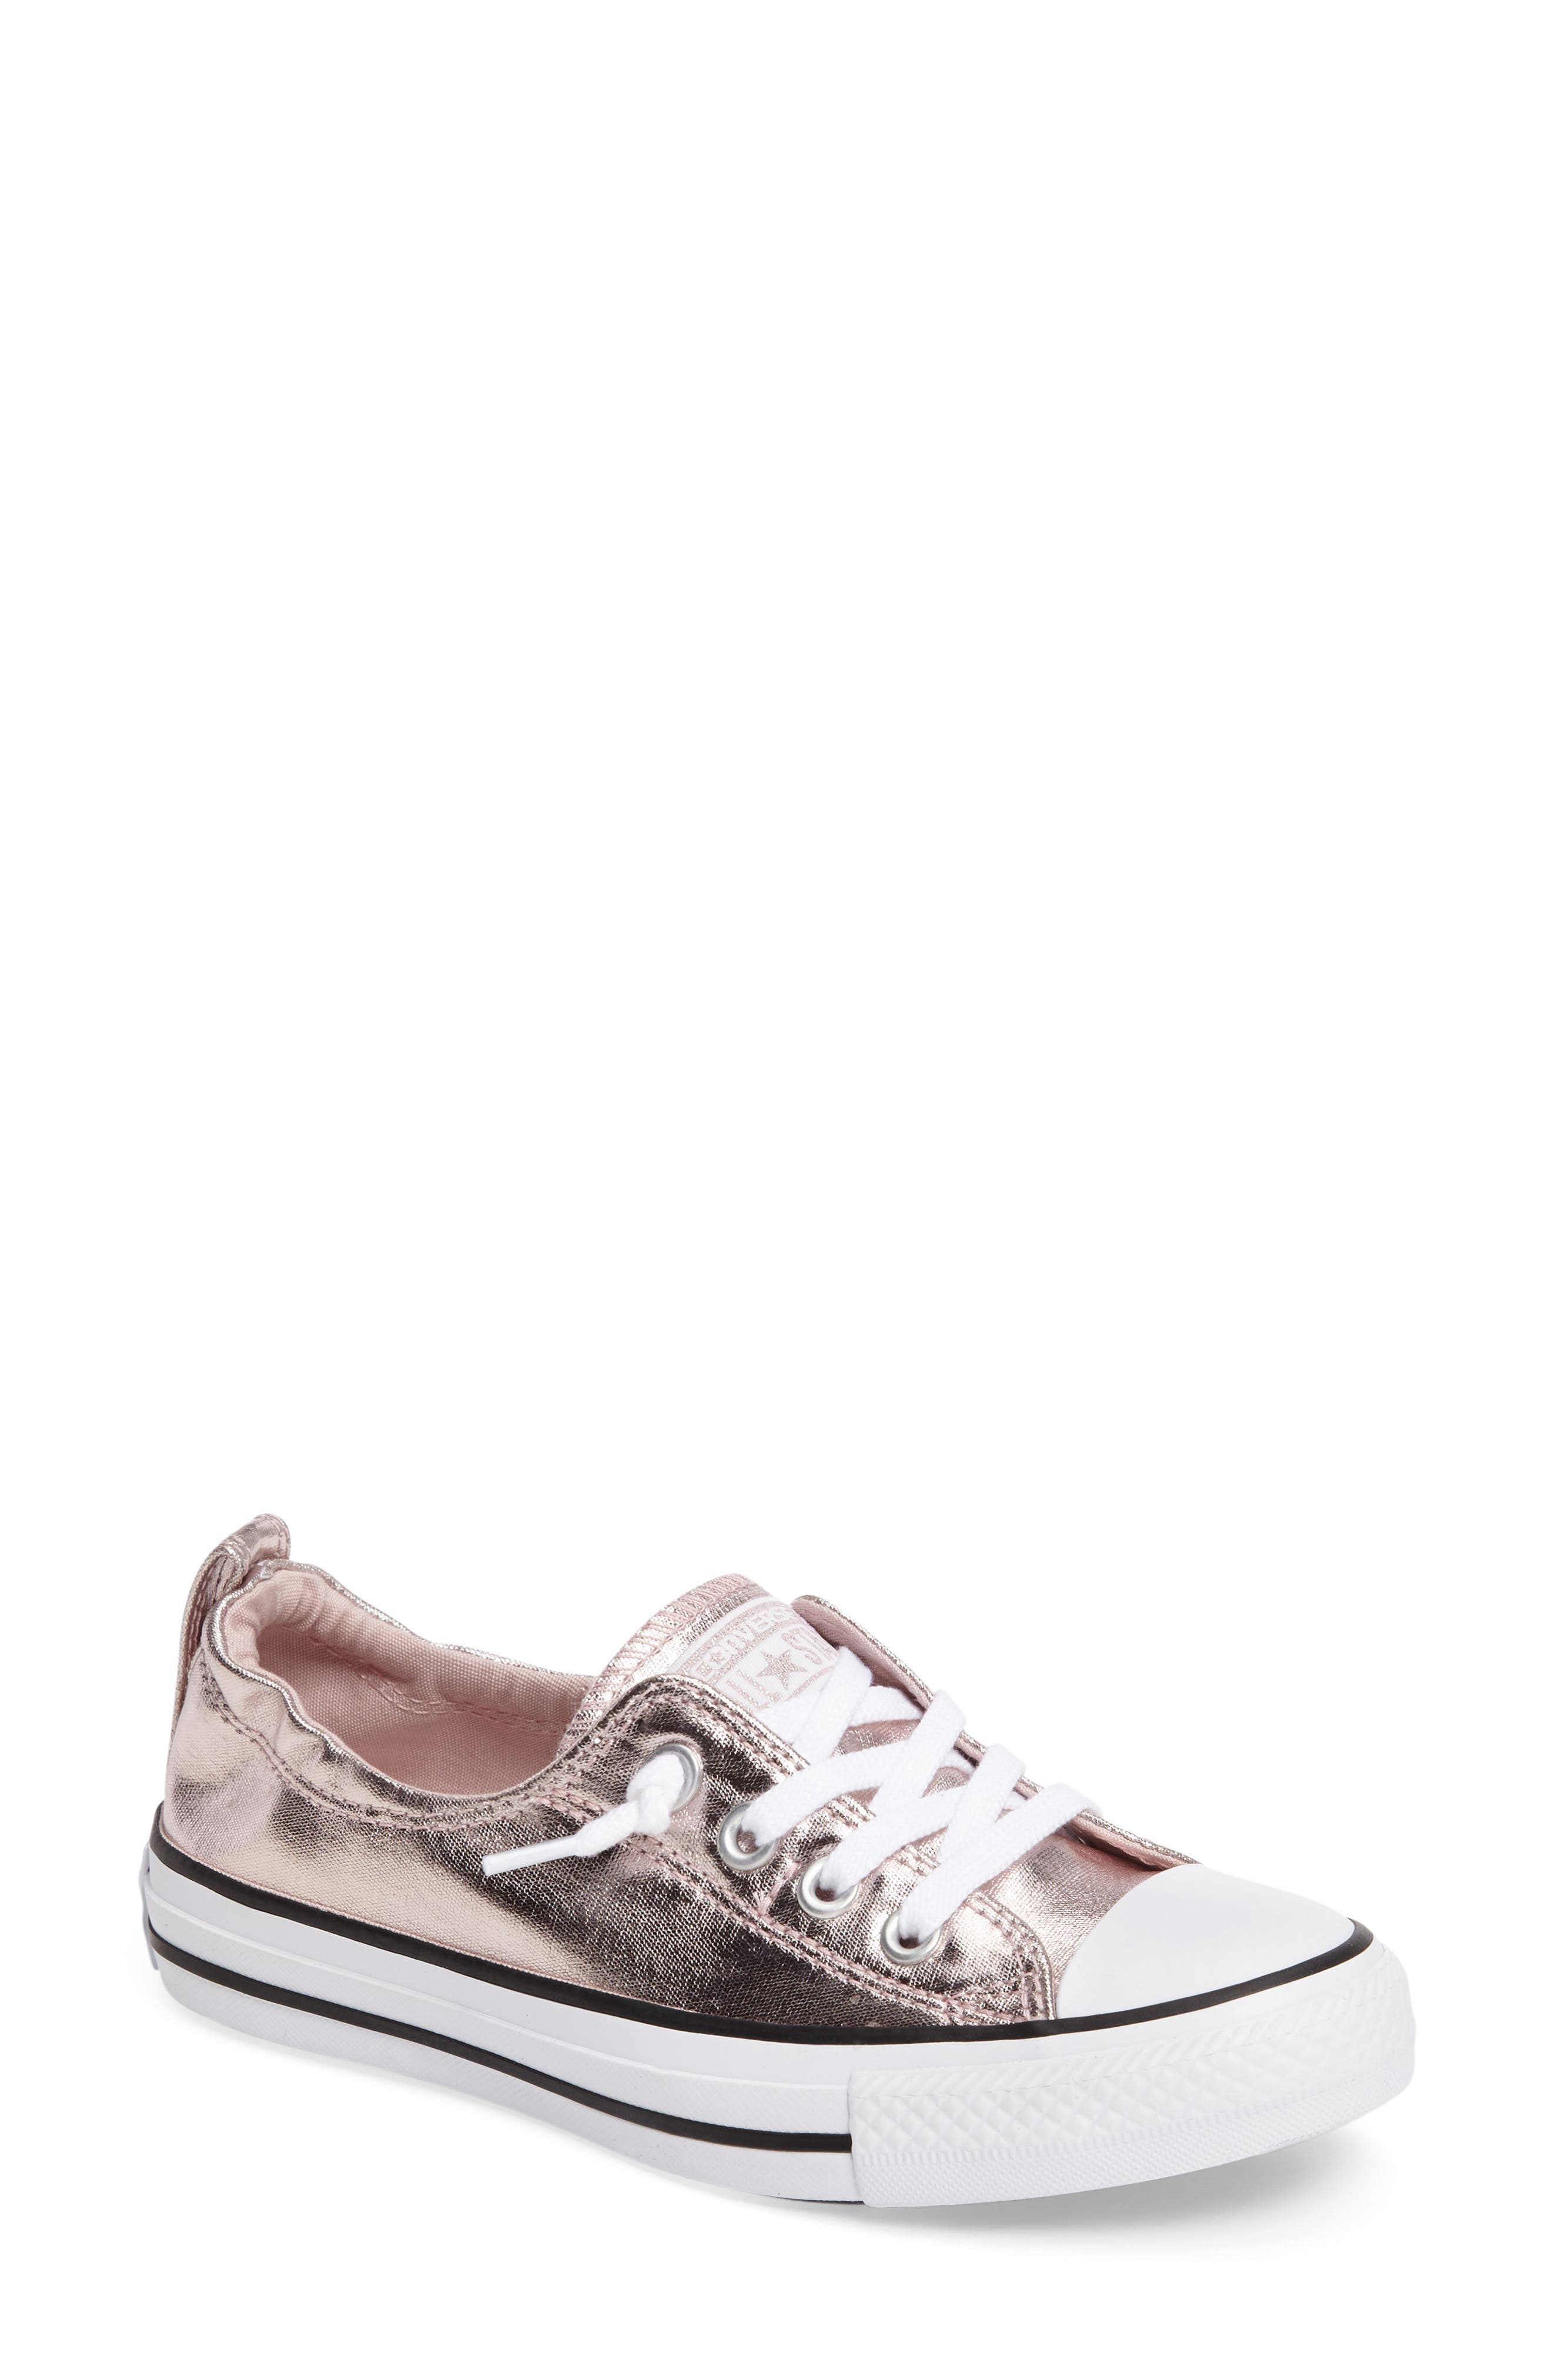 Converse Chuck Taylor® All Star® Shoreline Low Top Sneaker (Women)